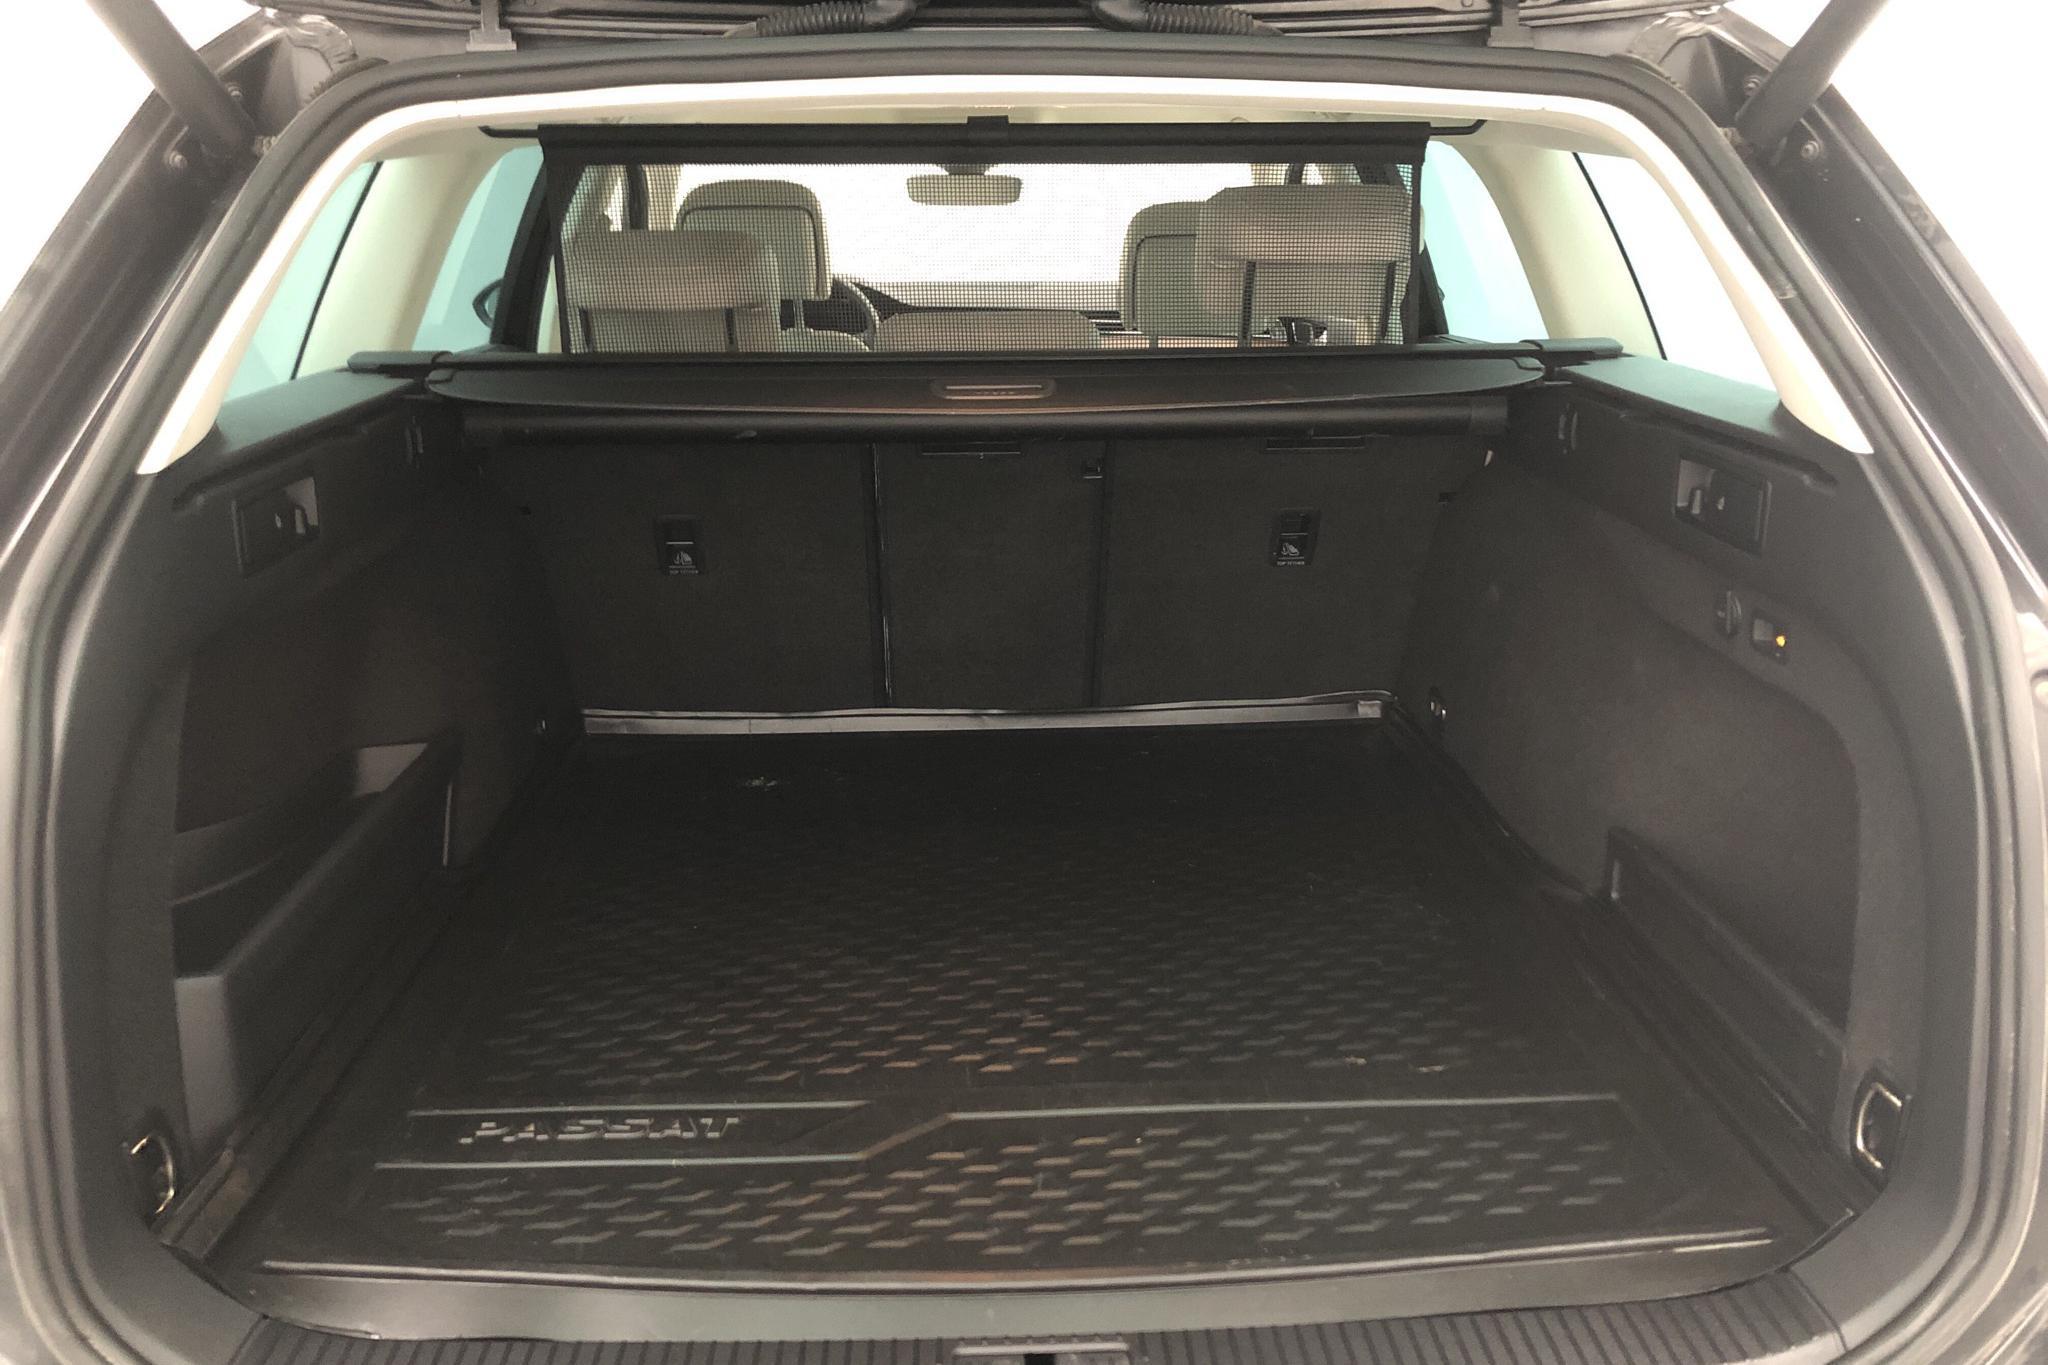 VW Passat 1.4 Plug-in-Hybrid Sportscombi (218hk) - 138 800 km - Automatic - Dark Grey - 2018